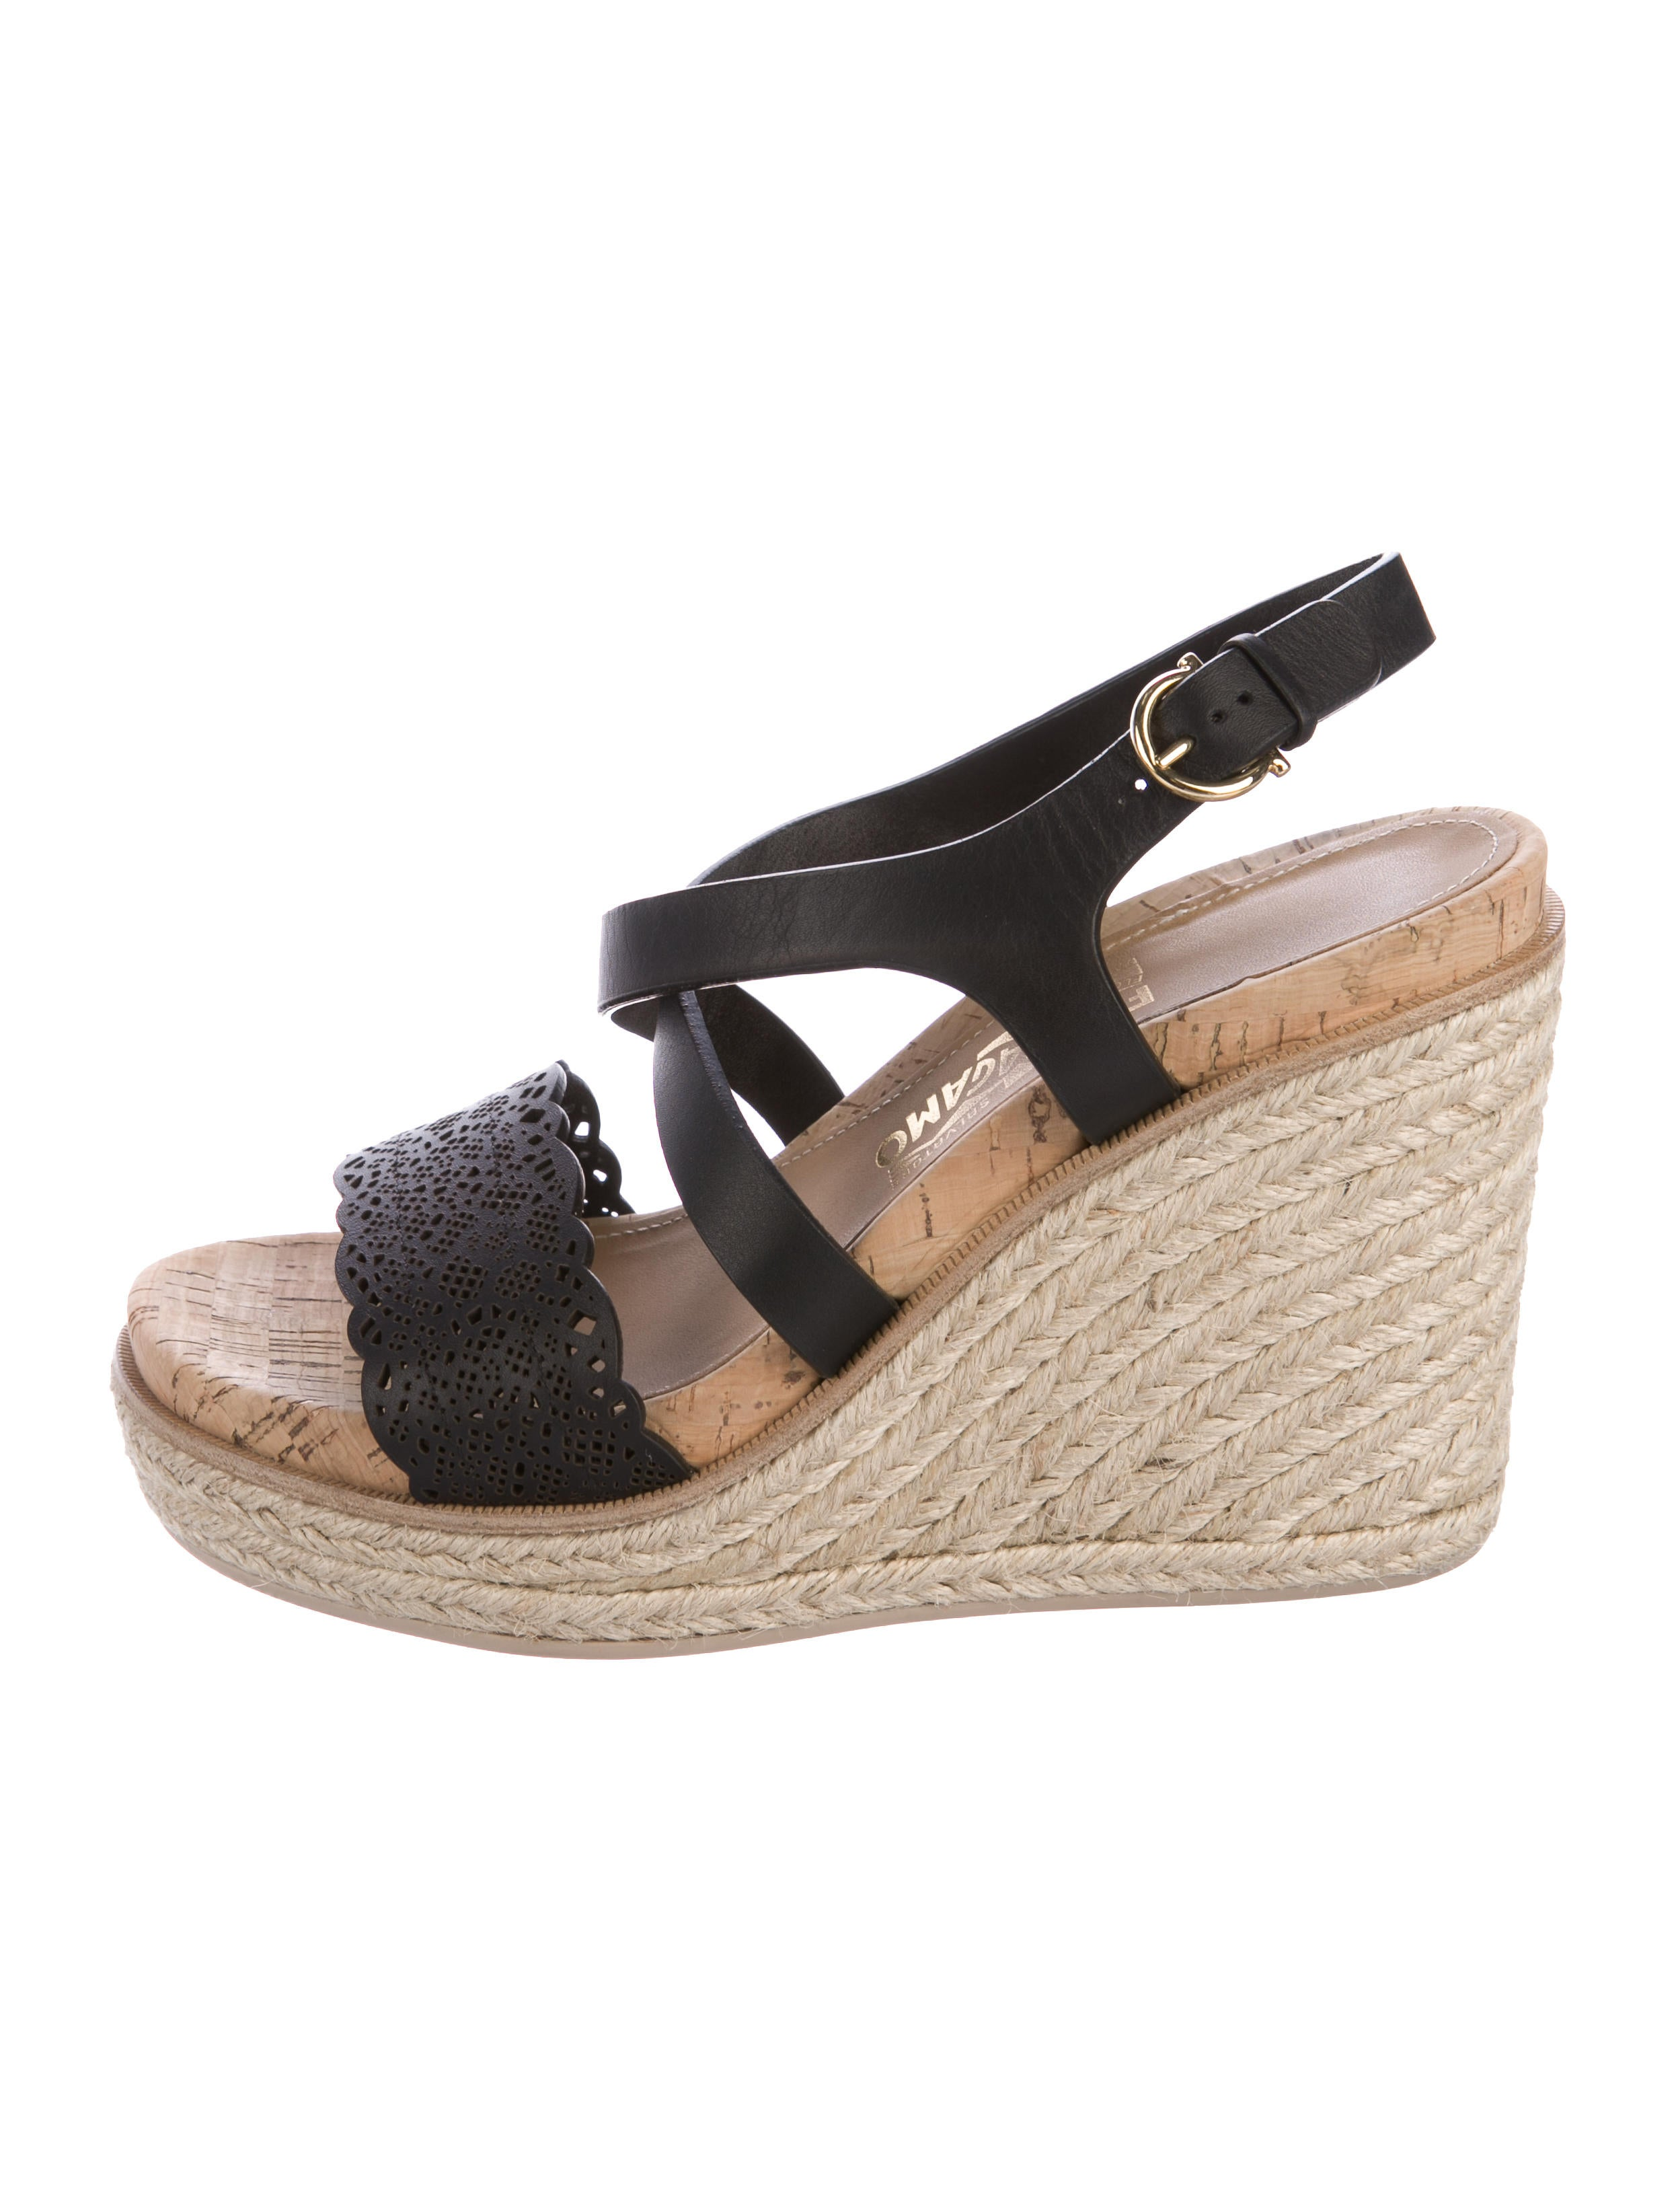 b9d2e7eb3ff3 Salvatore Ferragamo Gioela Platform Wedge Sandals - Shoes - SAL54949 ...